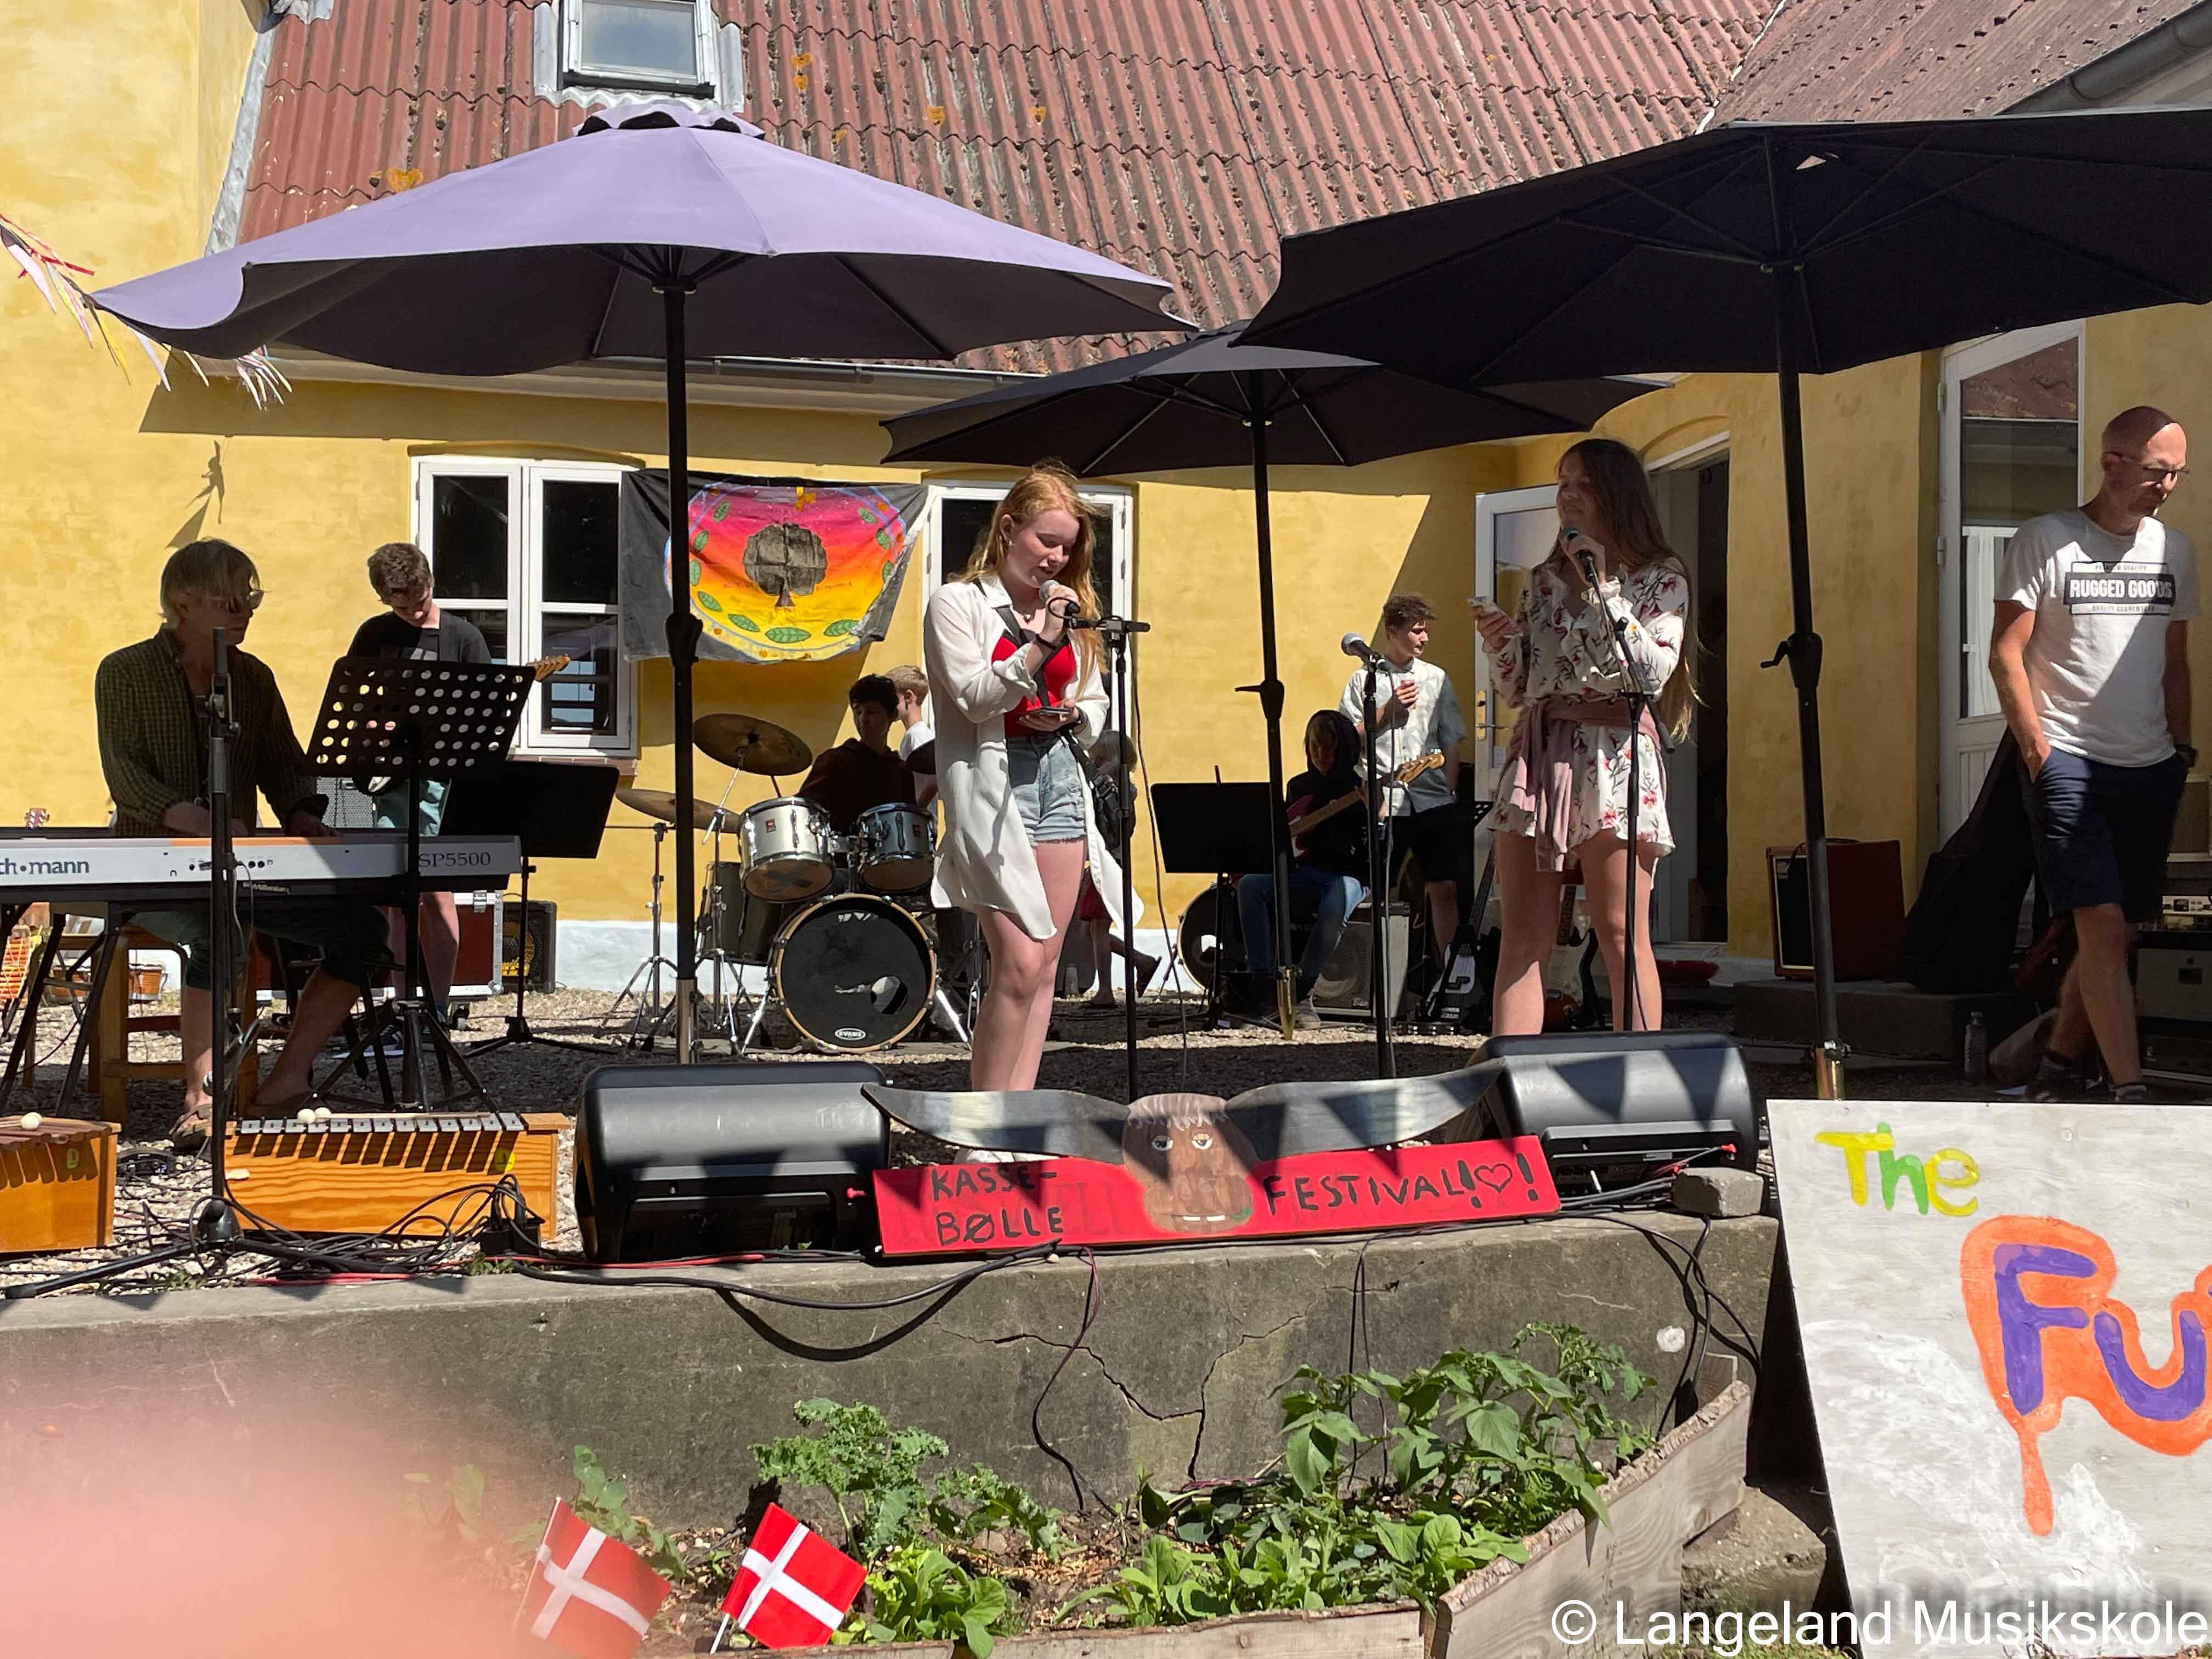 Kassebøllefestival '21